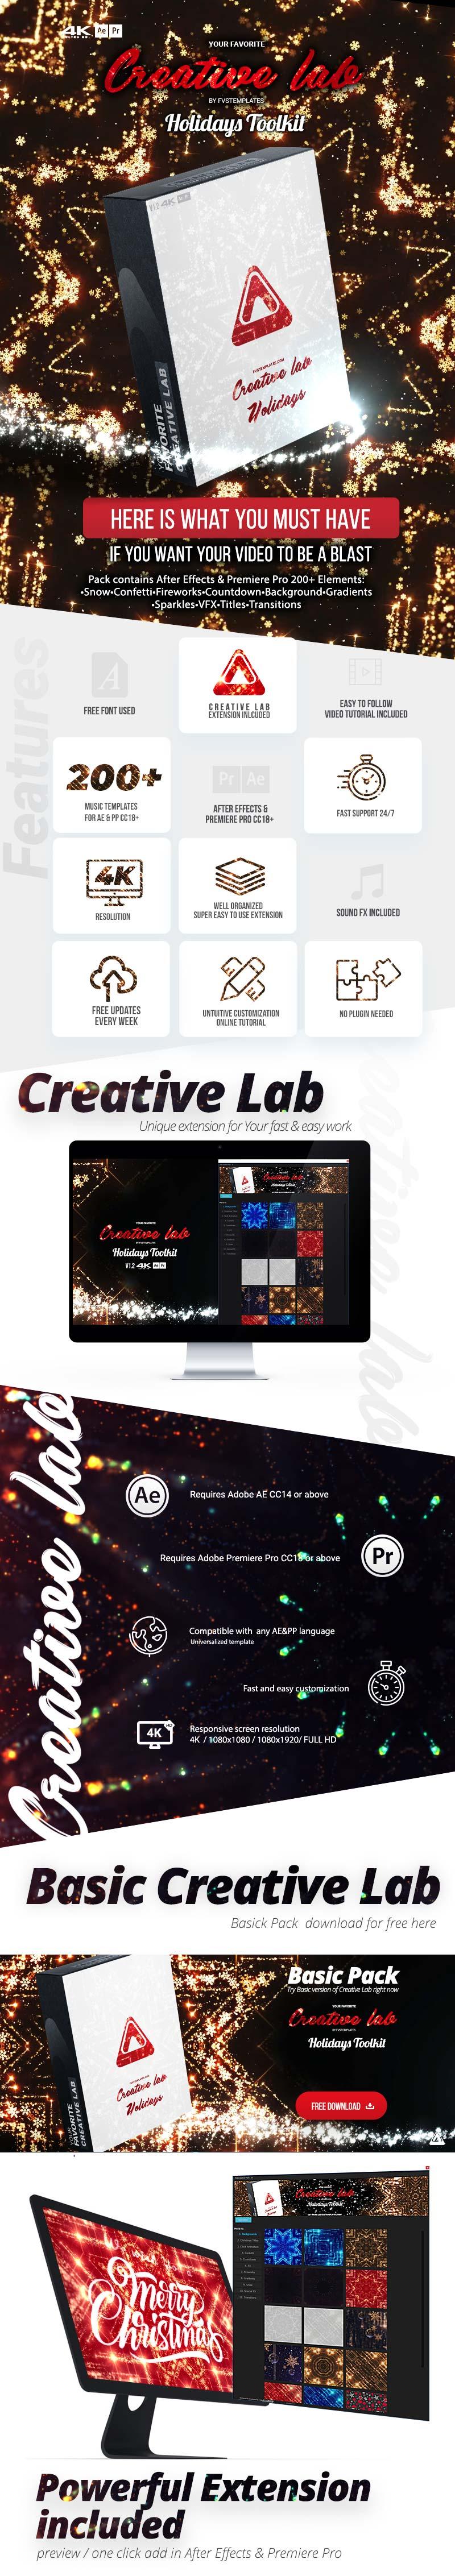 AE/PR脚本-圣诞节新年派对庆典活动时钟倒计时背景烟花雪花元素动画工具箱插图2